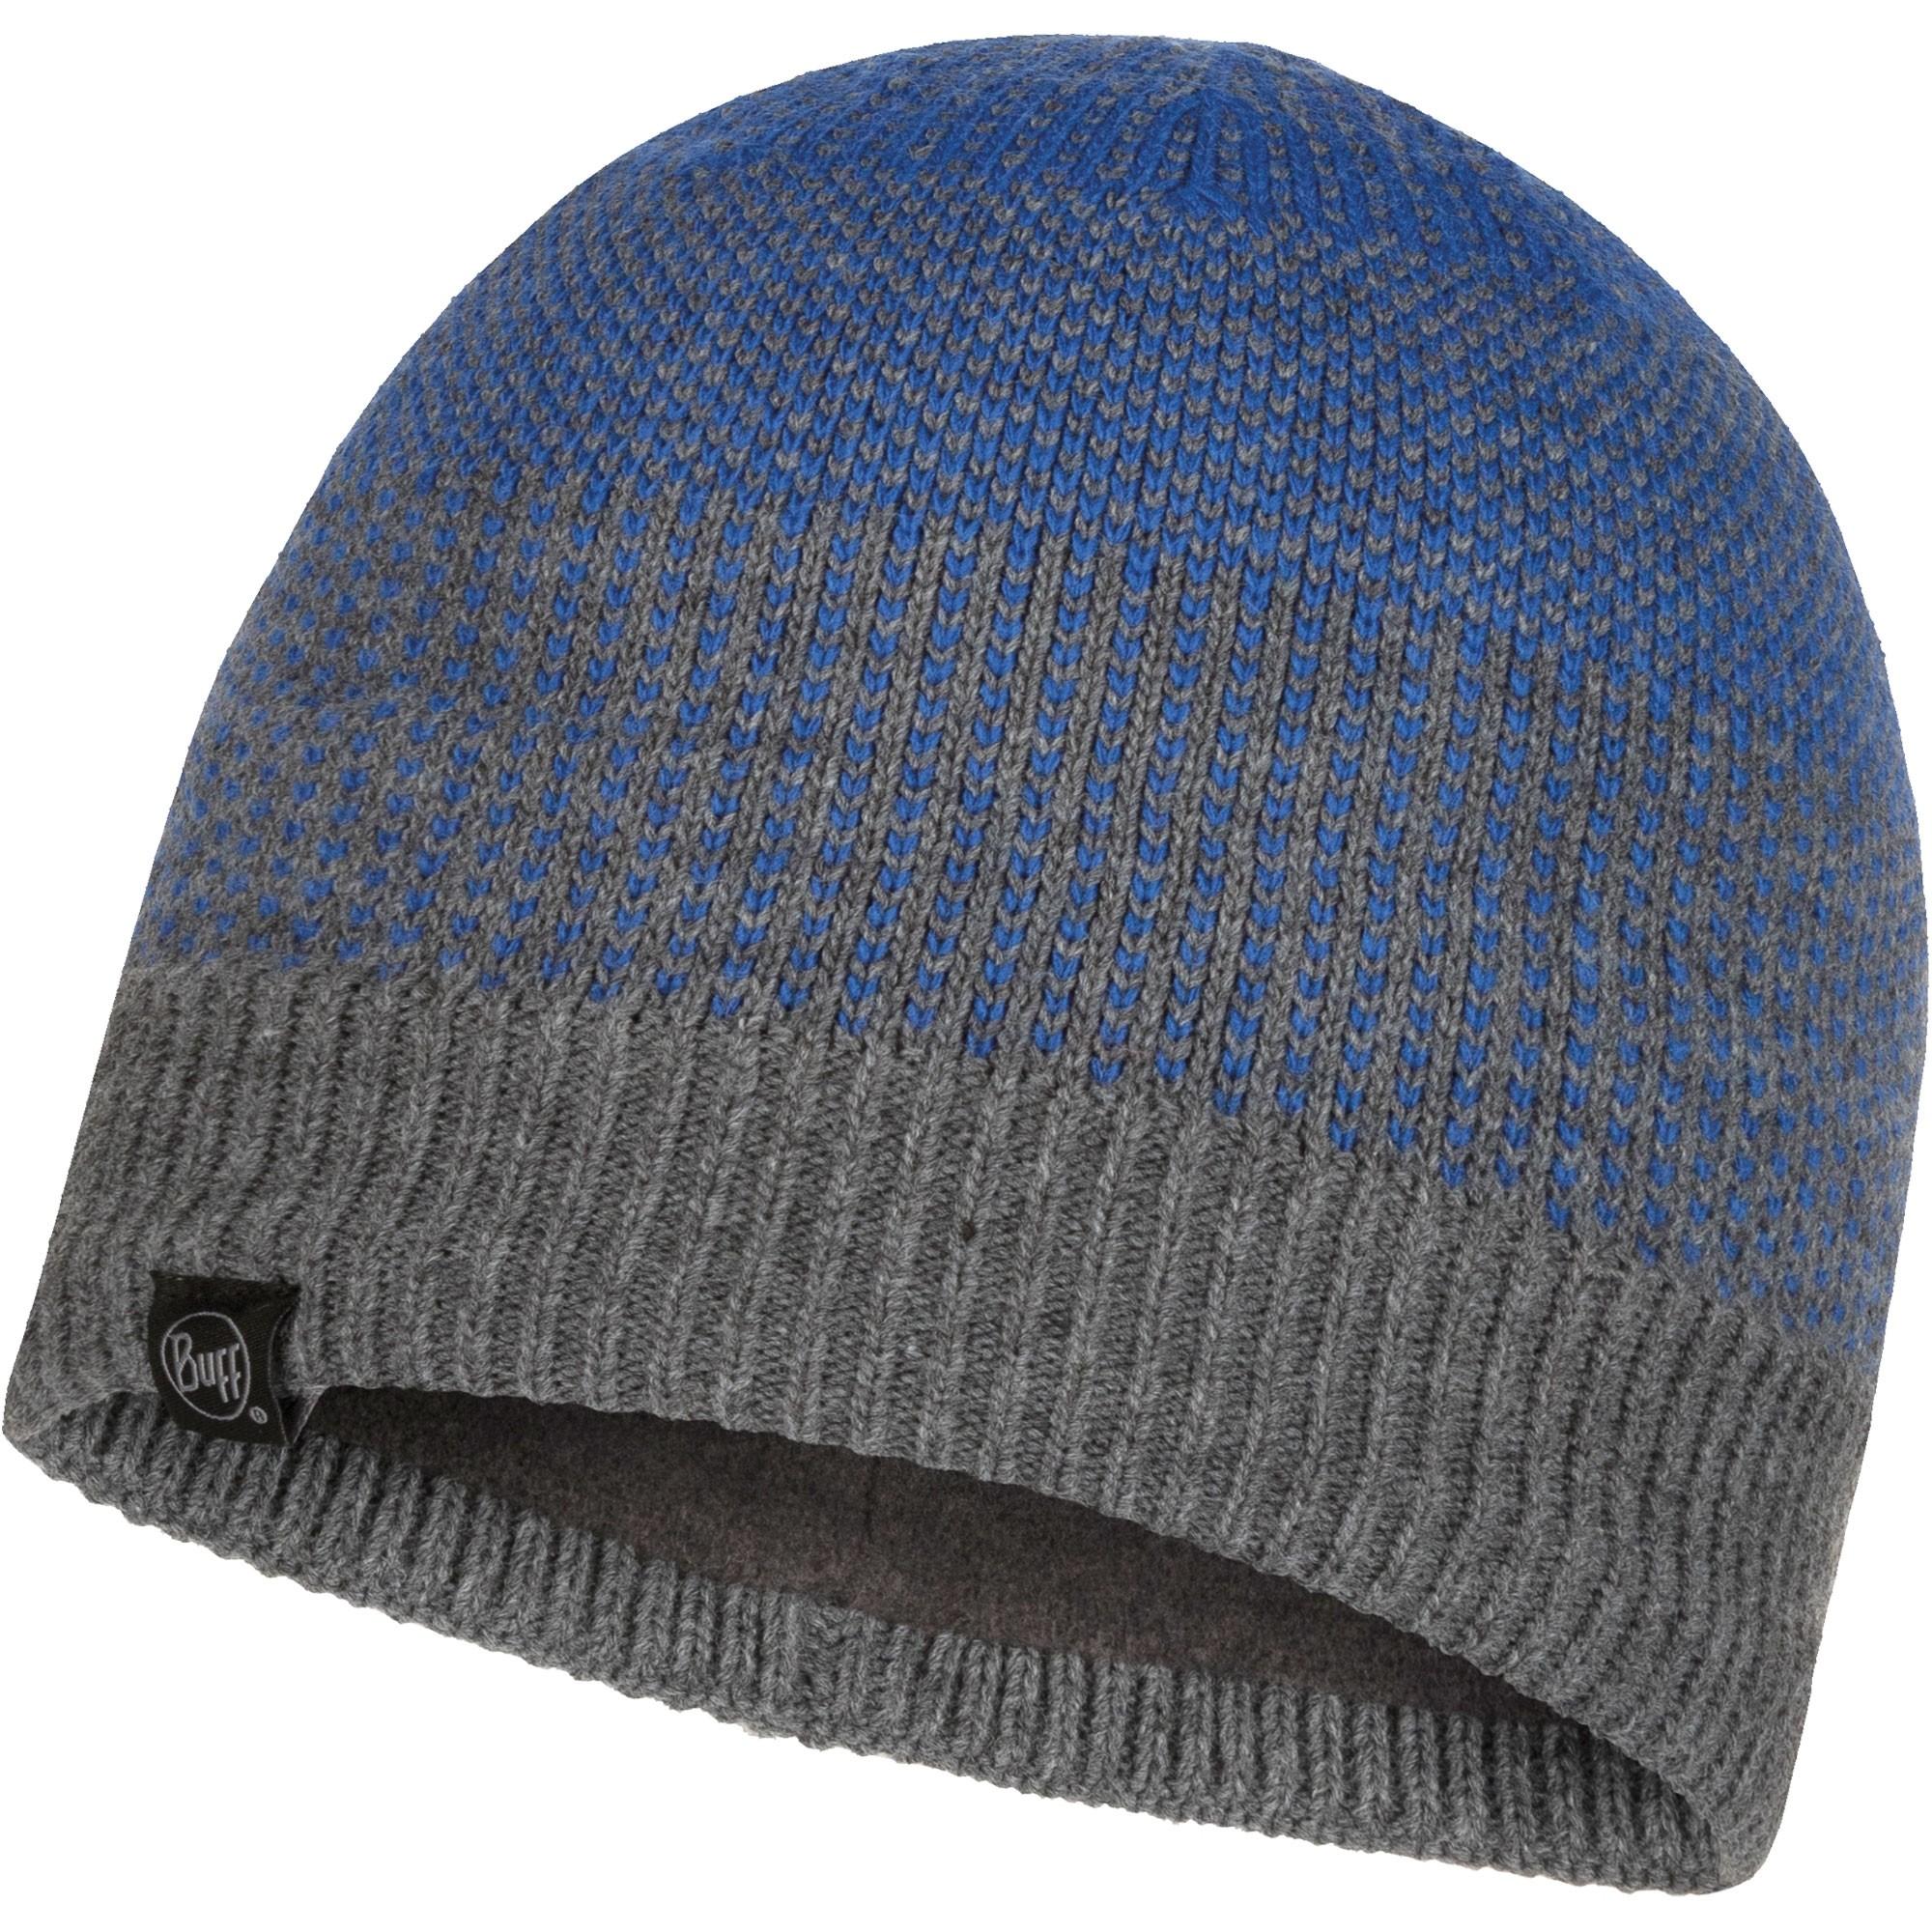 Buff Klaes Hat - Blue/Grey